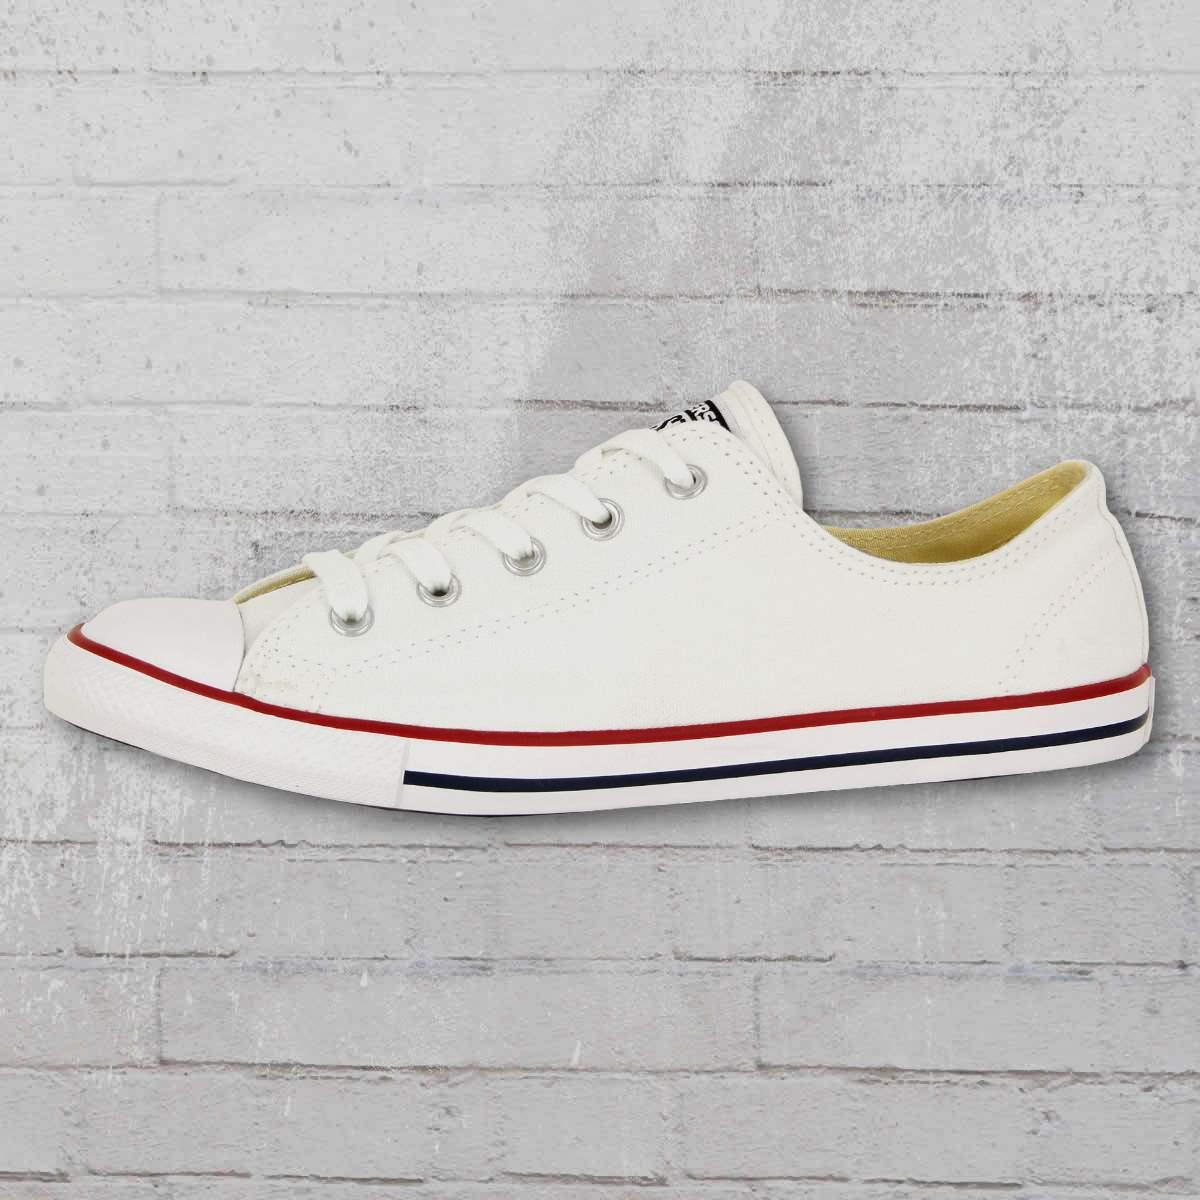 b5f58ecfb715 Converse Low Chucks Ladies Shoes CT Dainty OX white